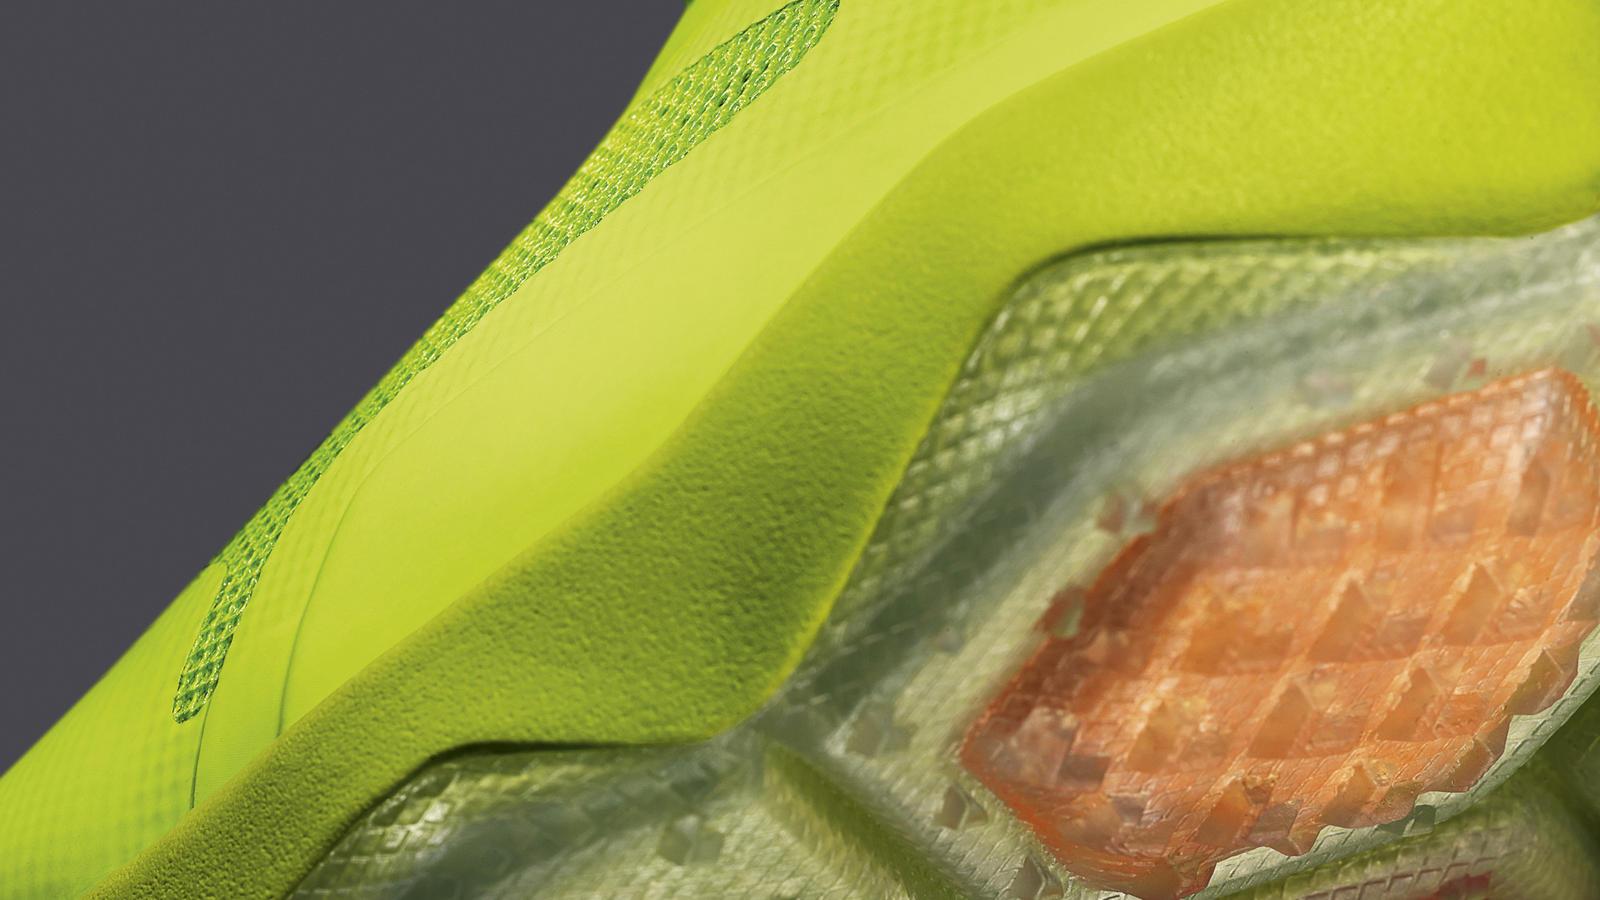 Hexagonal Nike Zoom Air